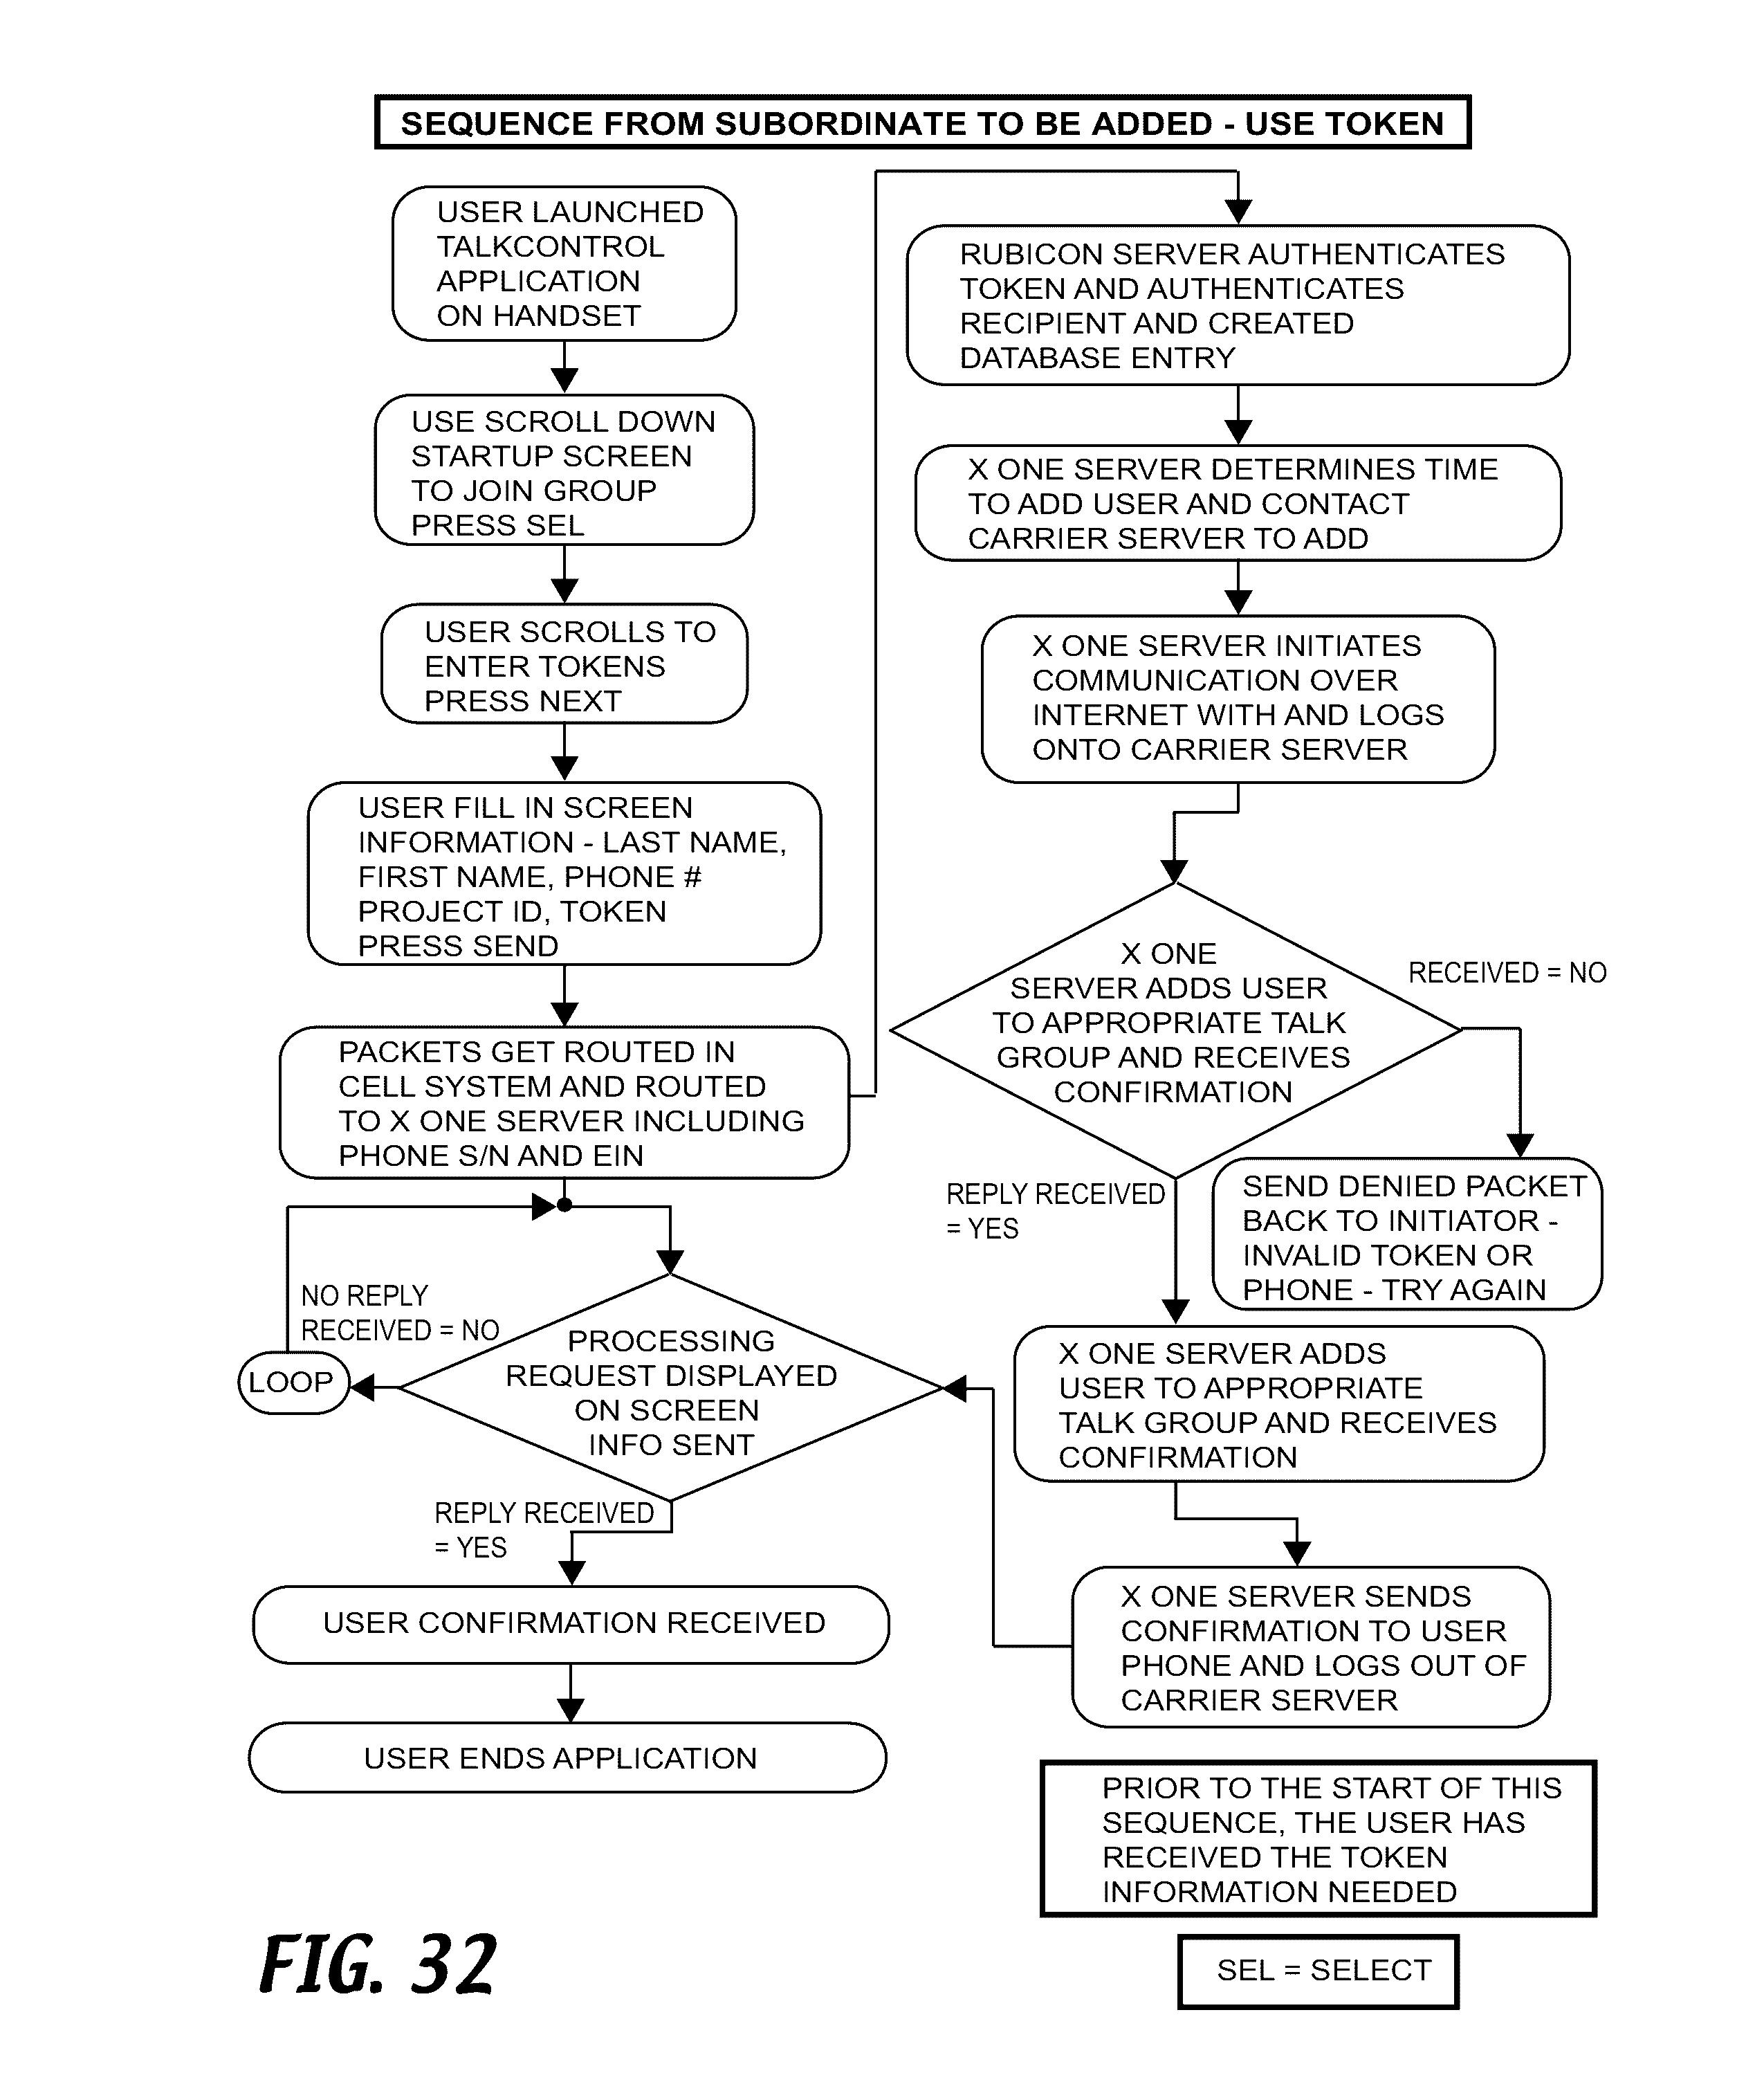 Patent US 9,467,832 B2